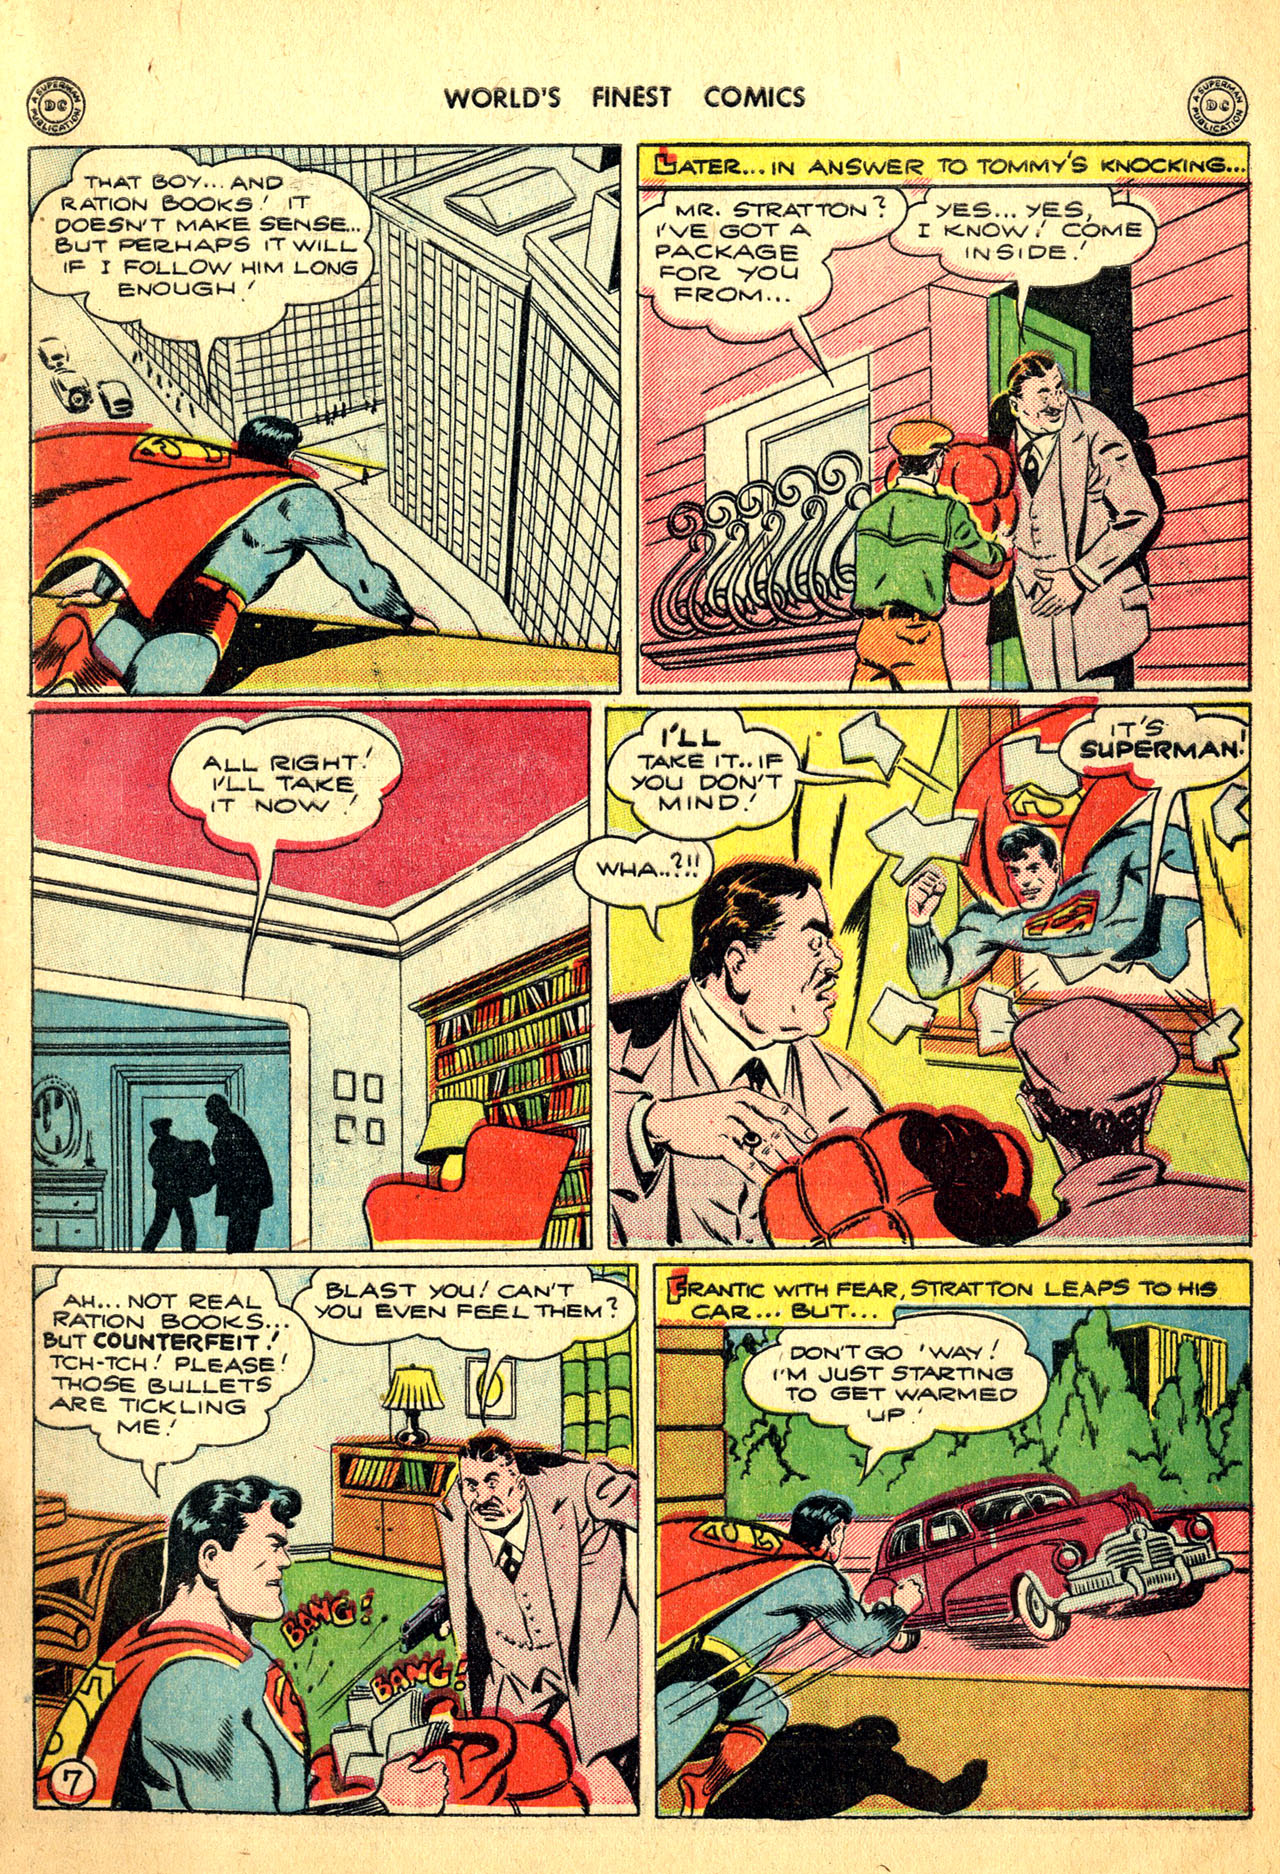 Read online World's Finest Comics comic -  Issue #18 - 9